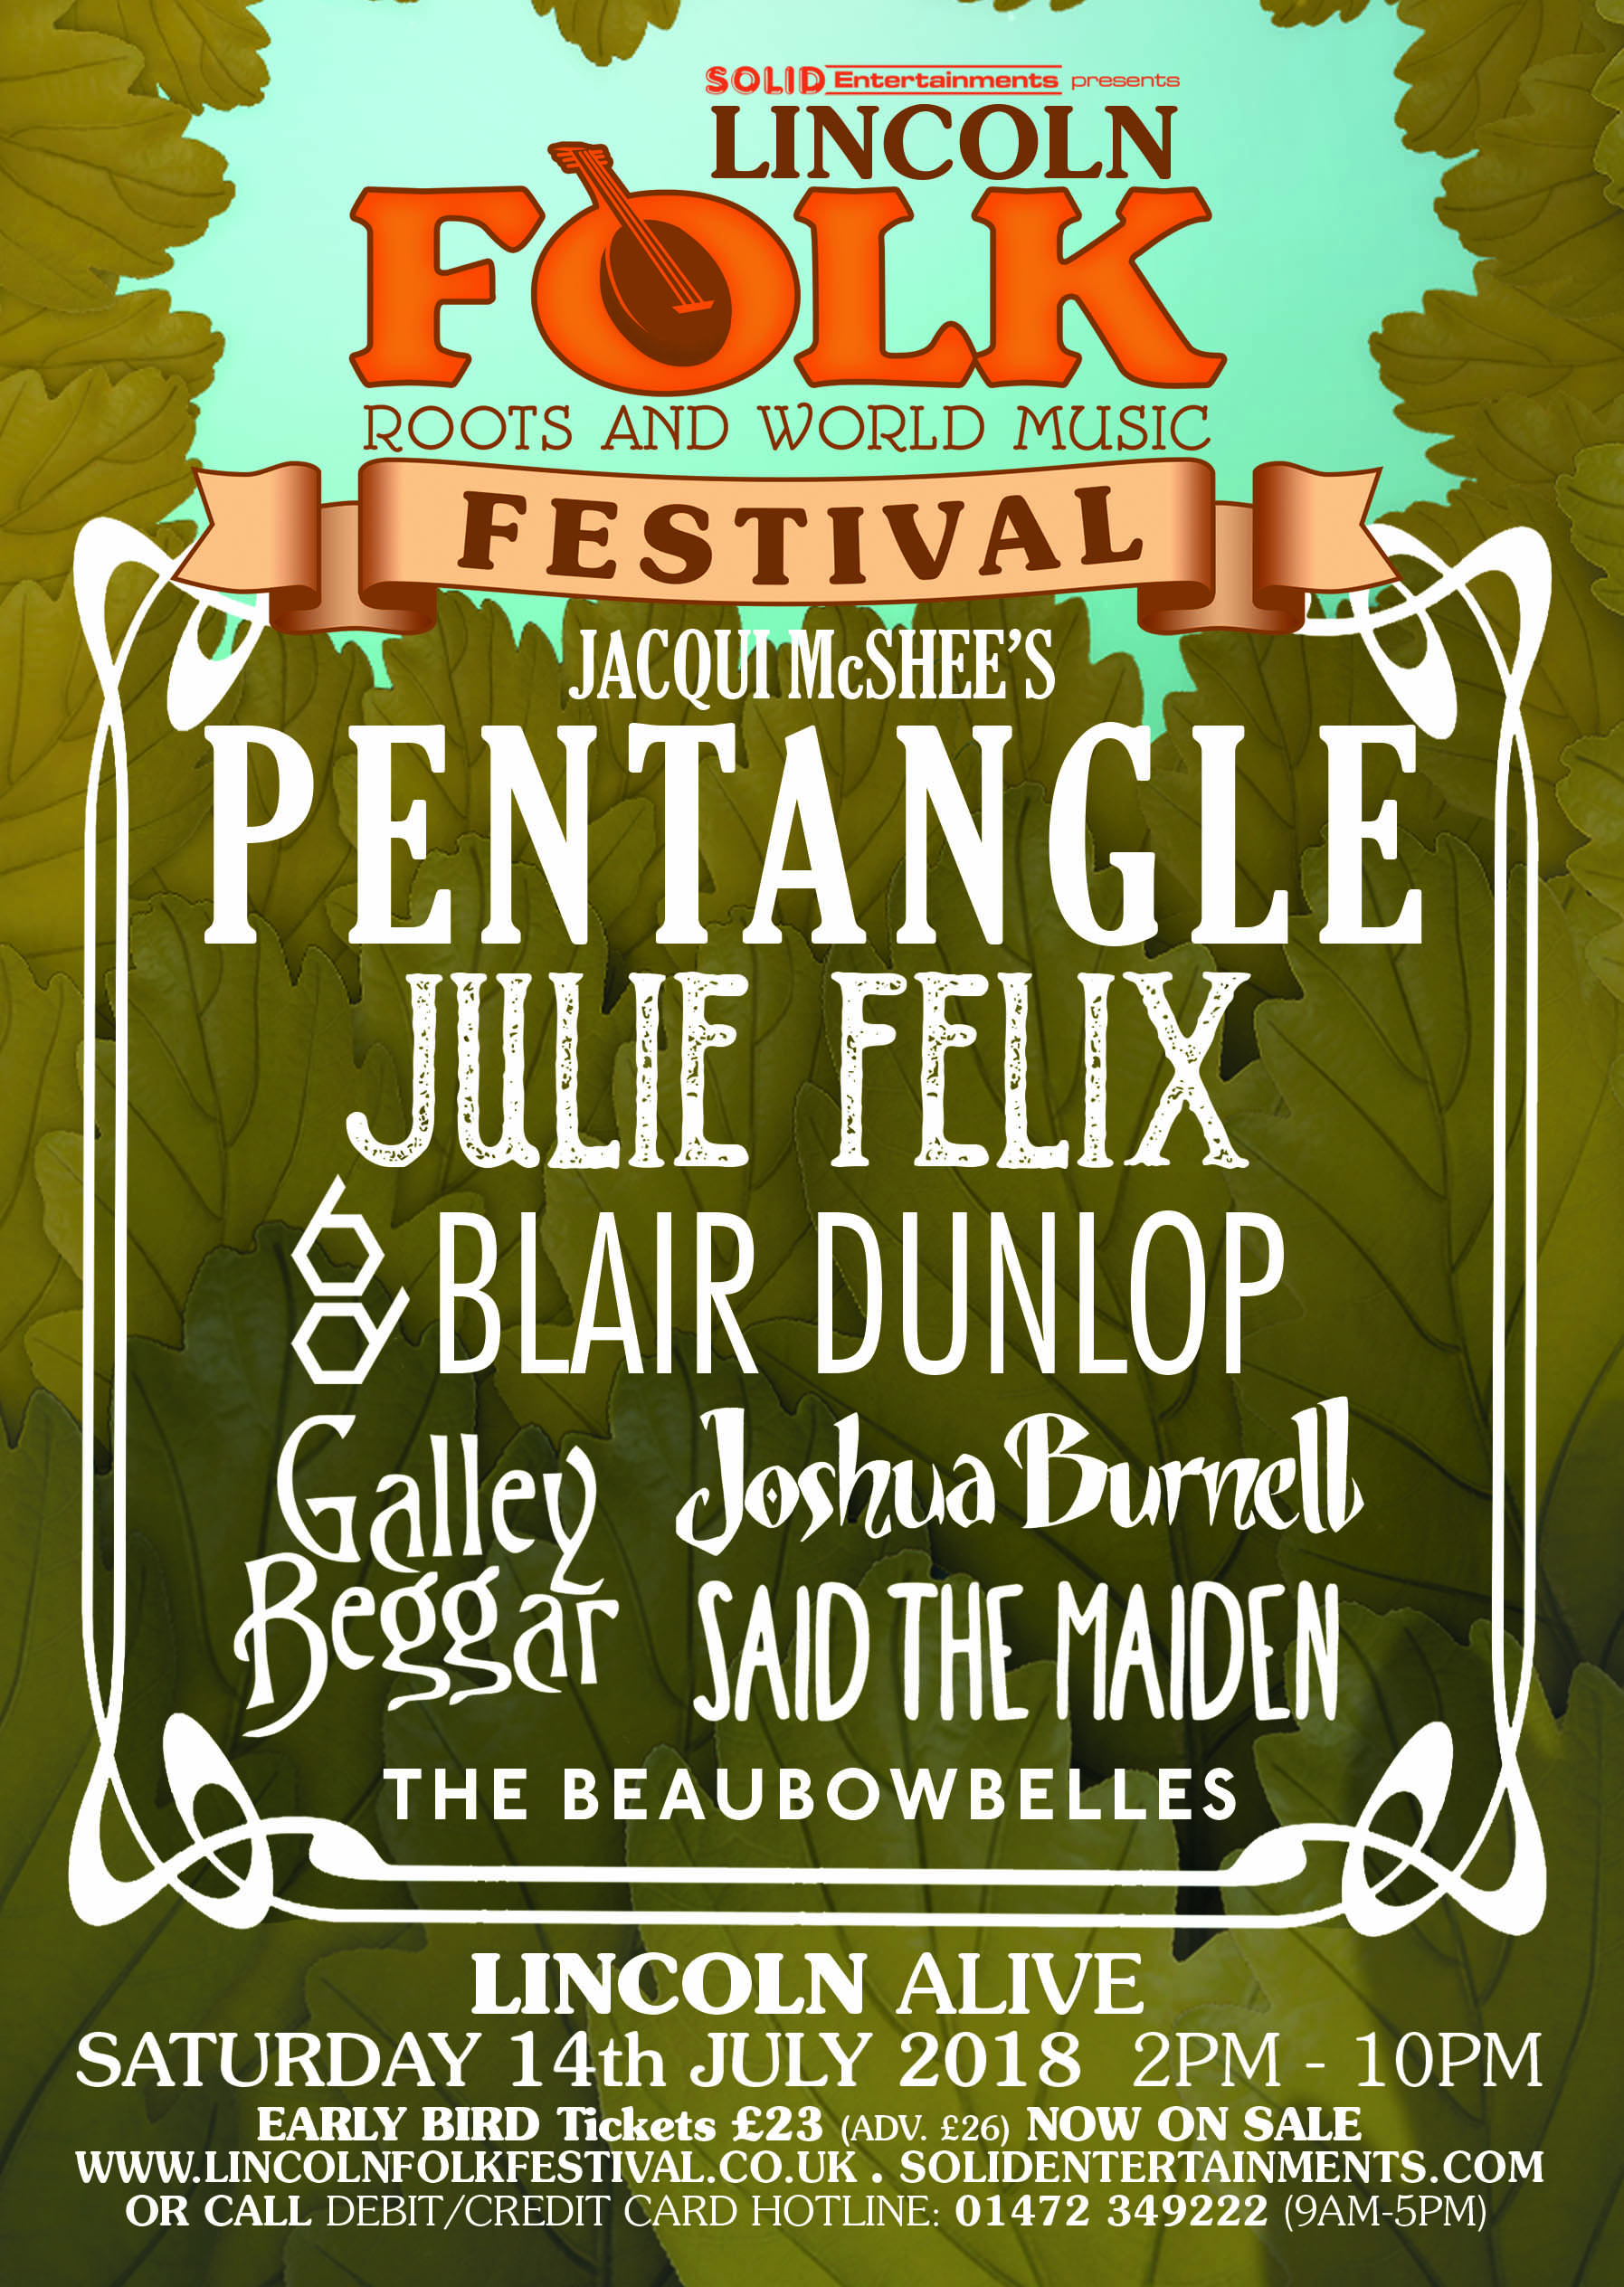 lincoln folk festival 2018 re size for leaflet